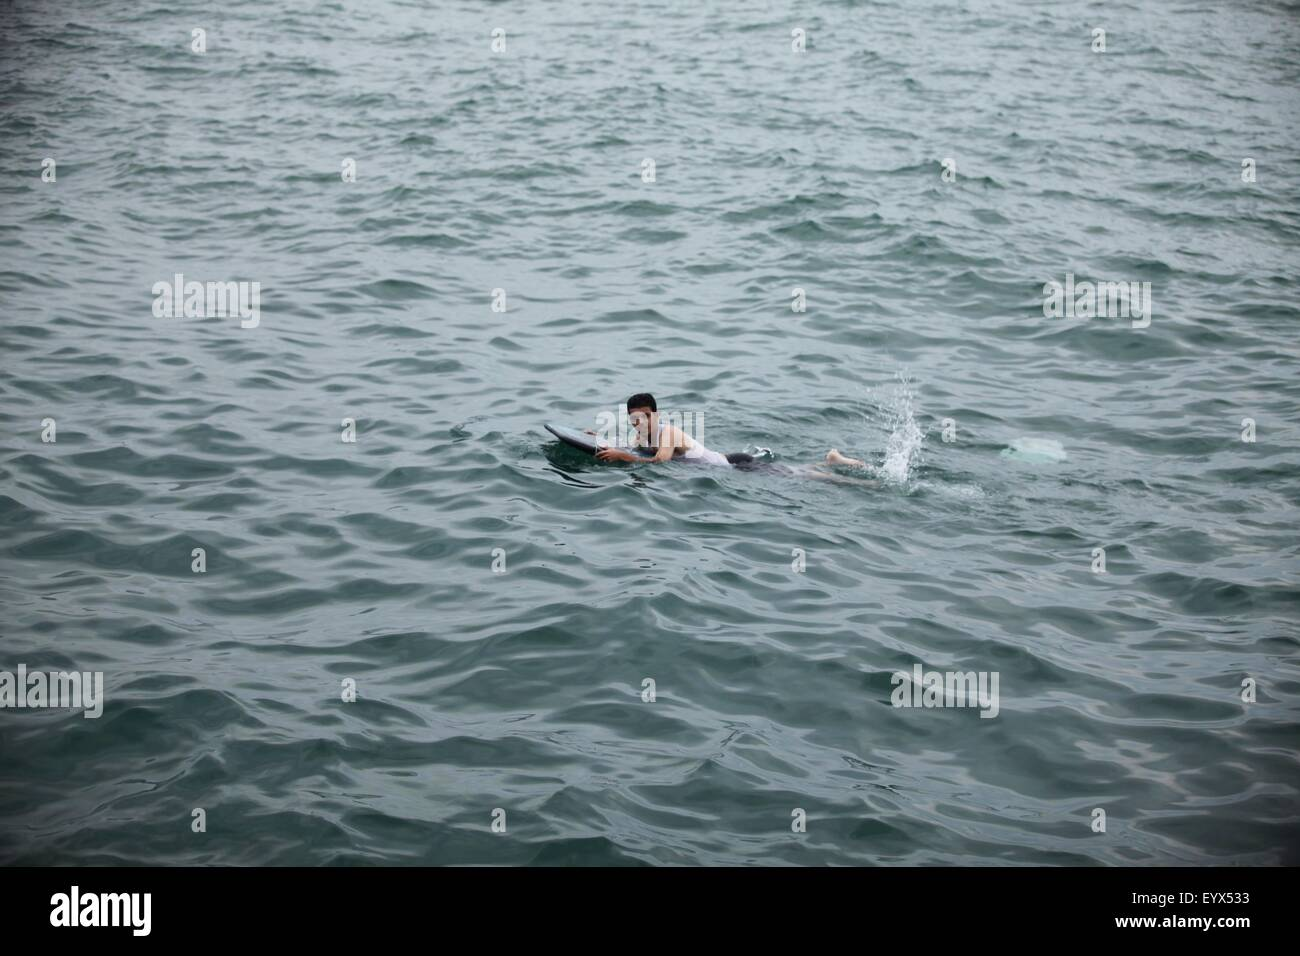 Gaza City, Gaza Strip, Palestinian Territory. 4th Aug, 2015. A Palestinian man swims in the Mediterranean Sea on - Stock Image